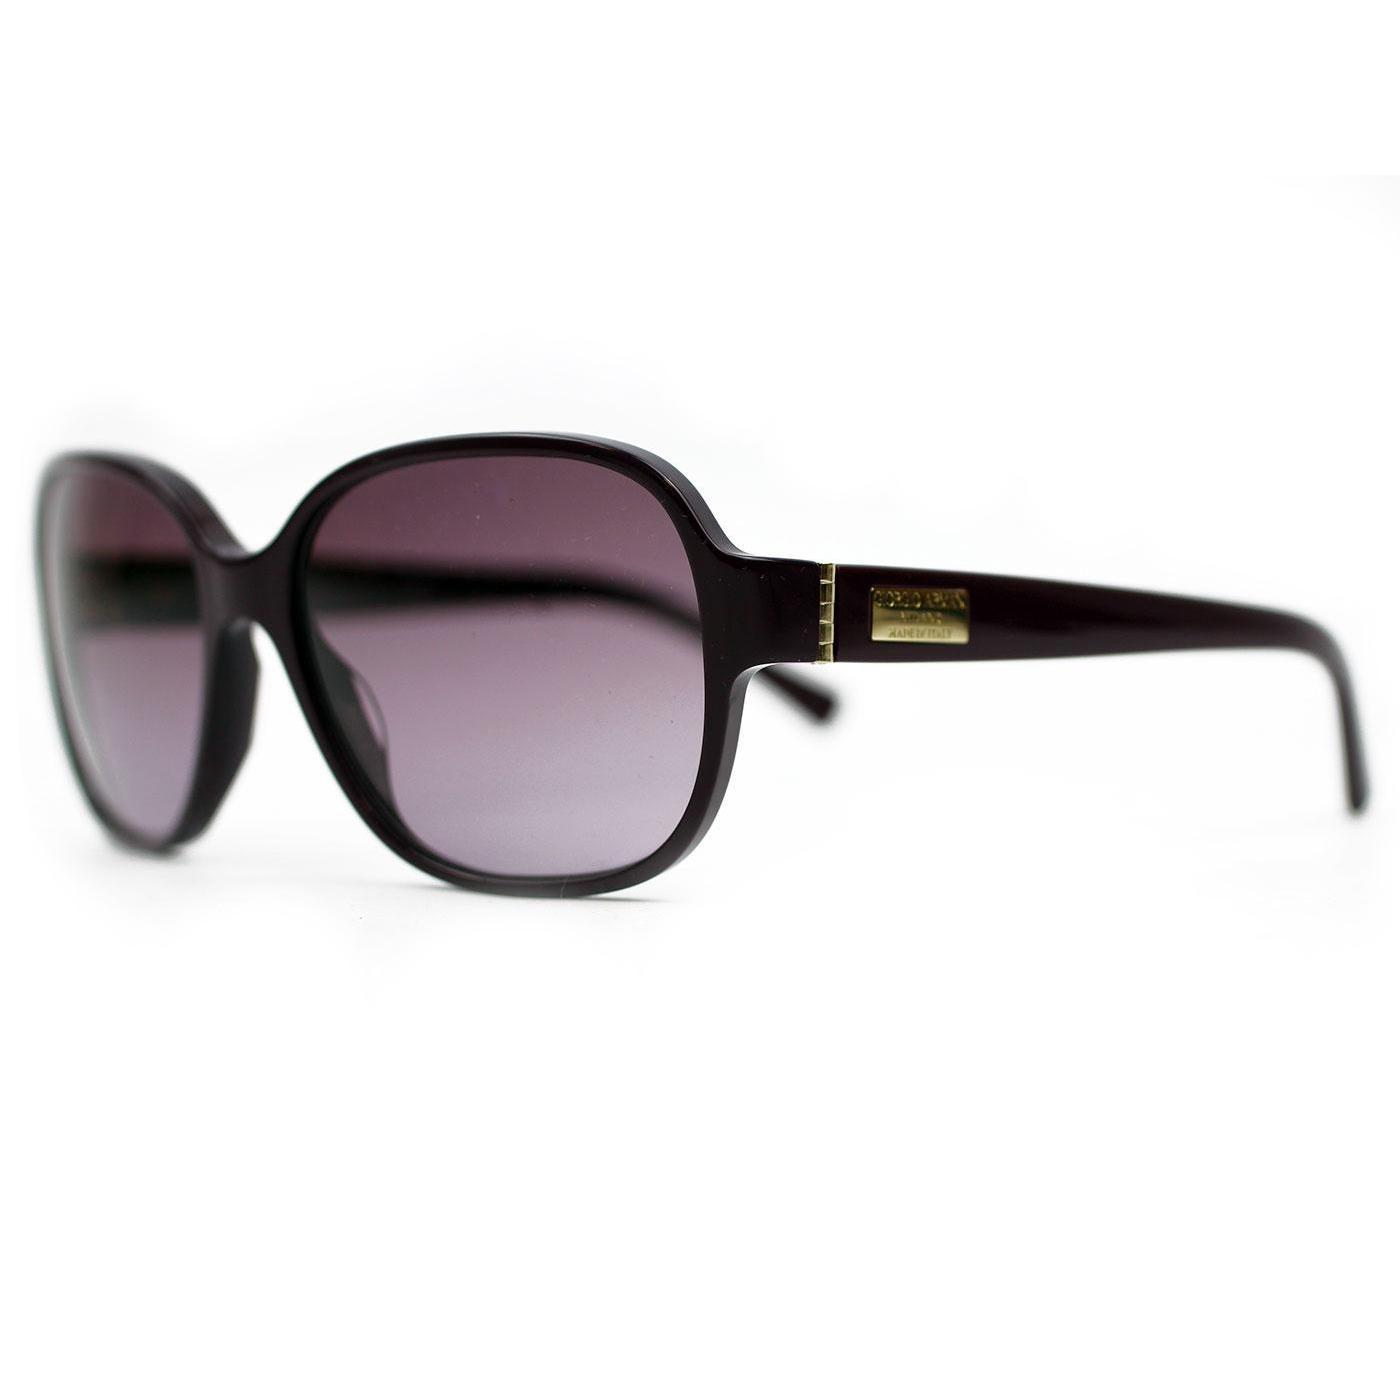 GIORGIO ARMANI 50s Retro Square Frame Sunglasses P